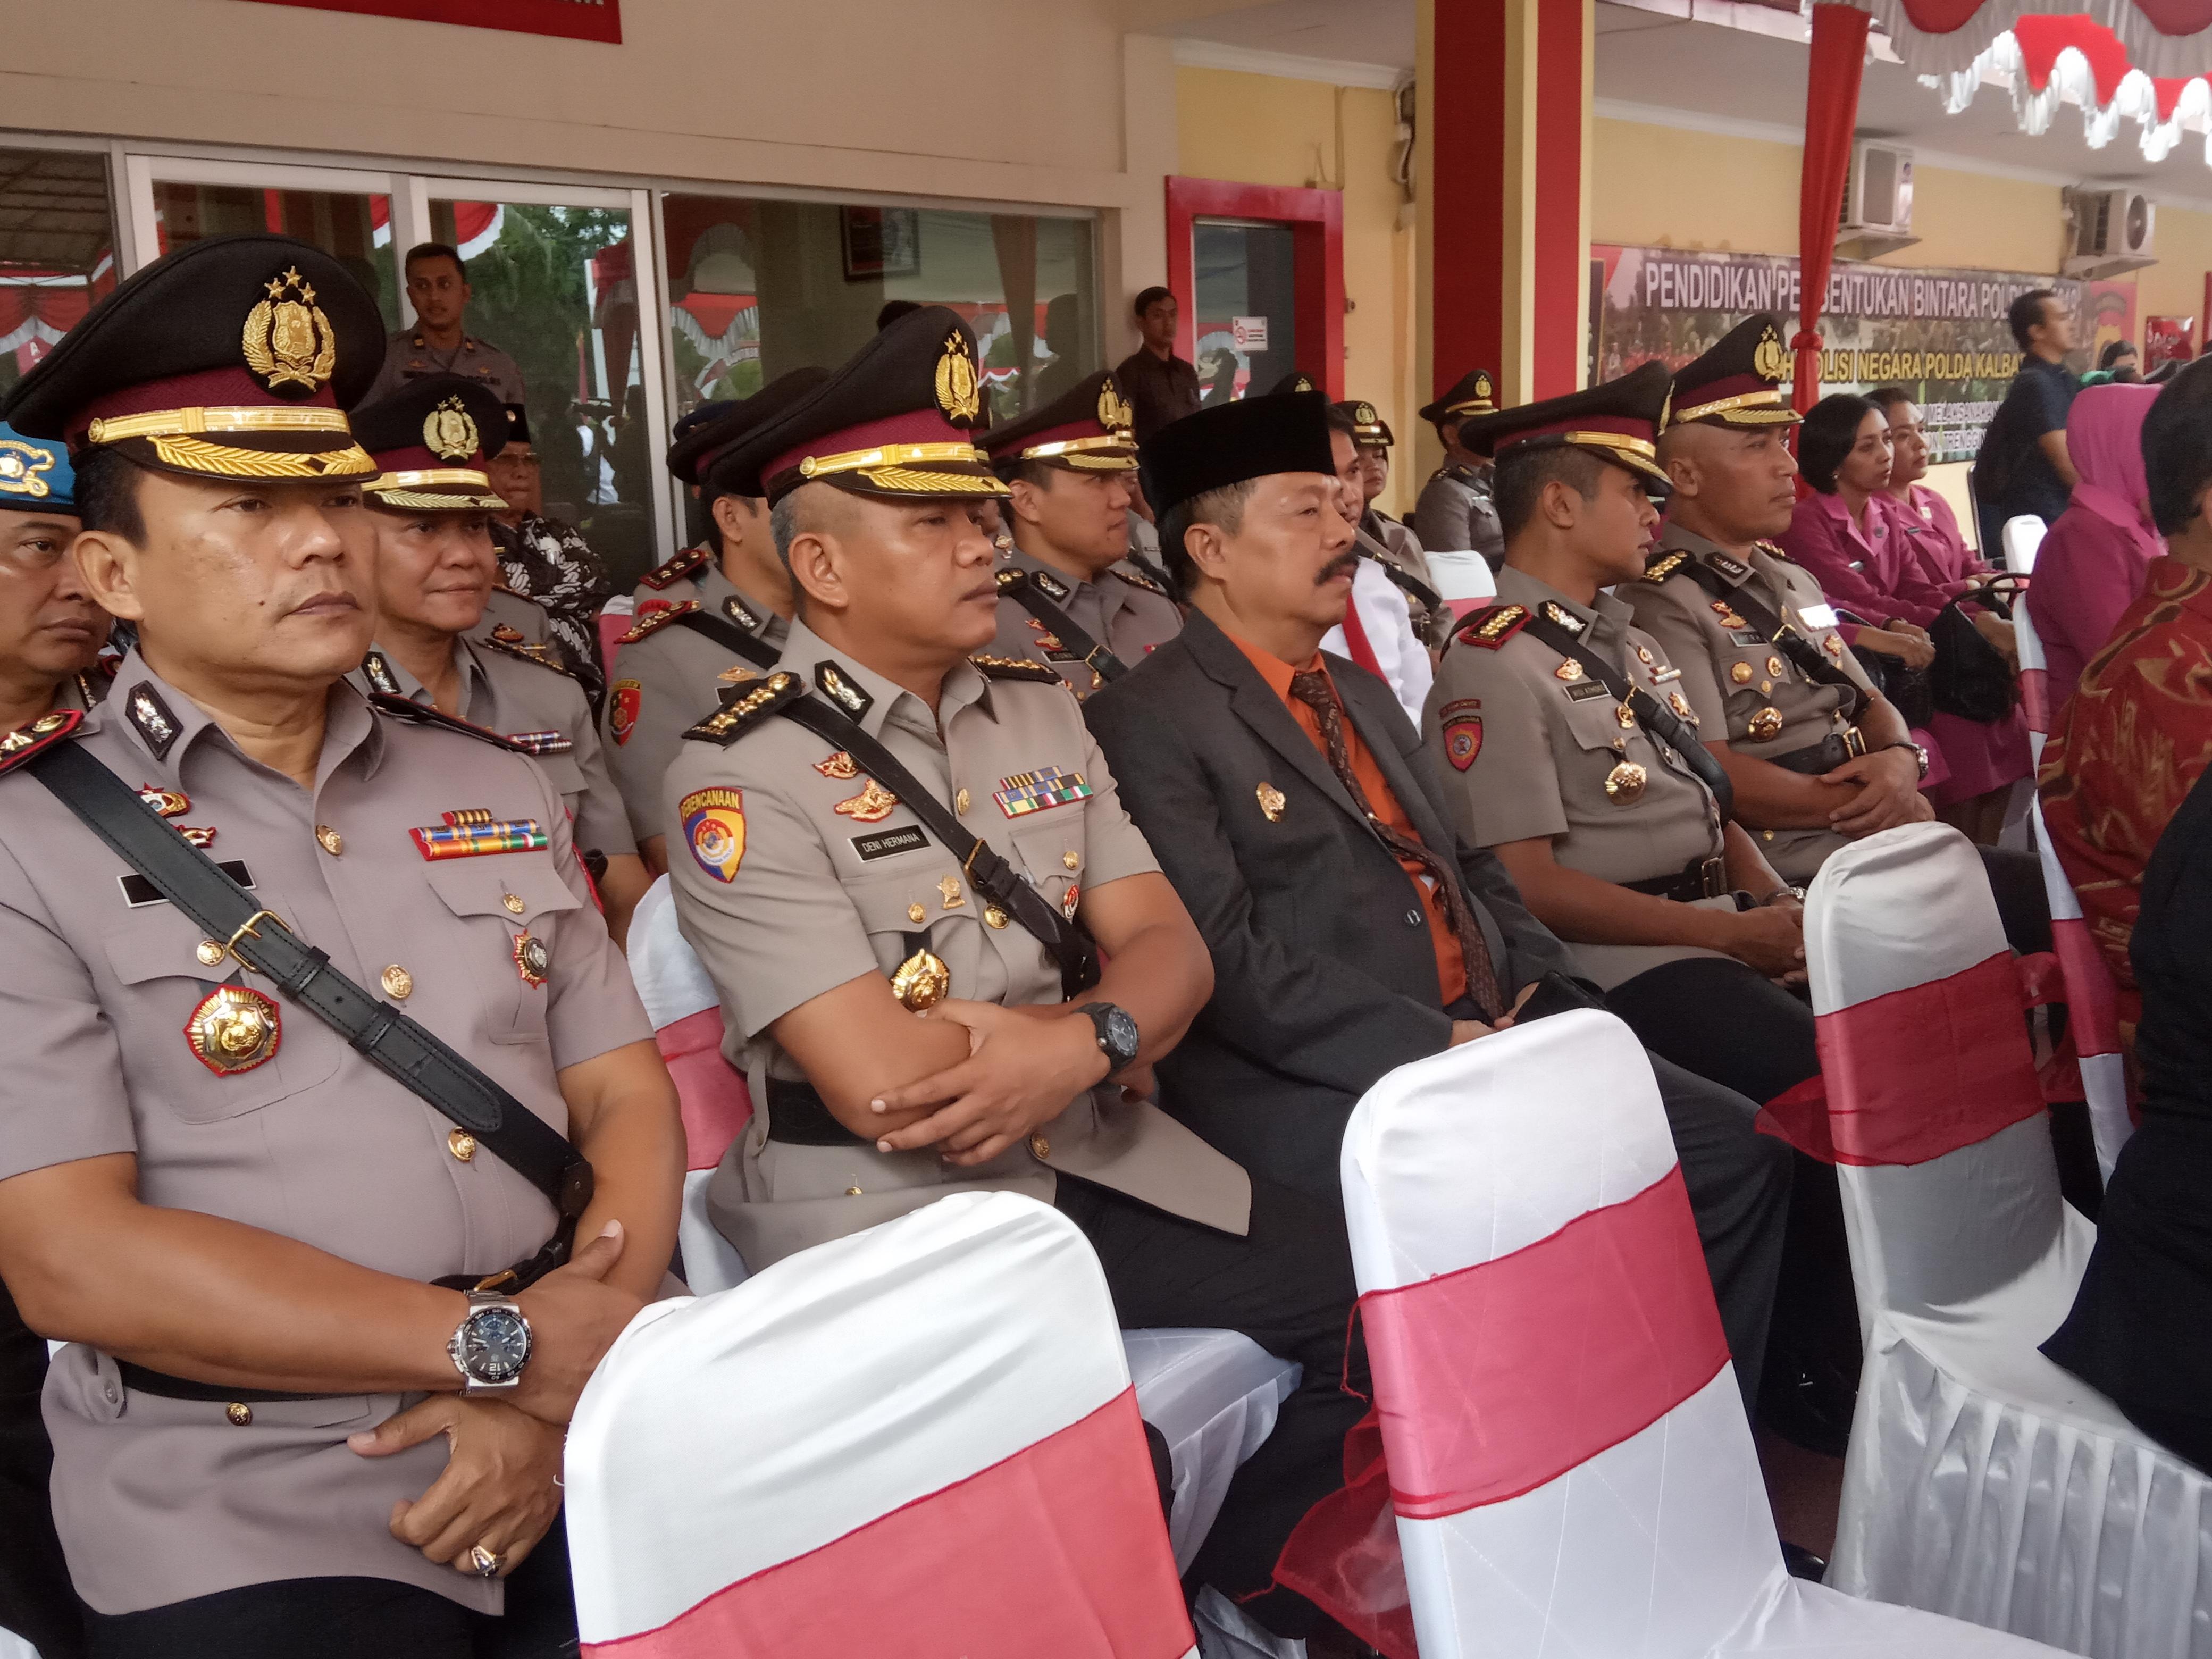 Wabup Sanggau Hadiri Penutupan Pendidikan Pembentukan Bintara Polri di SPN Polda Kalbar